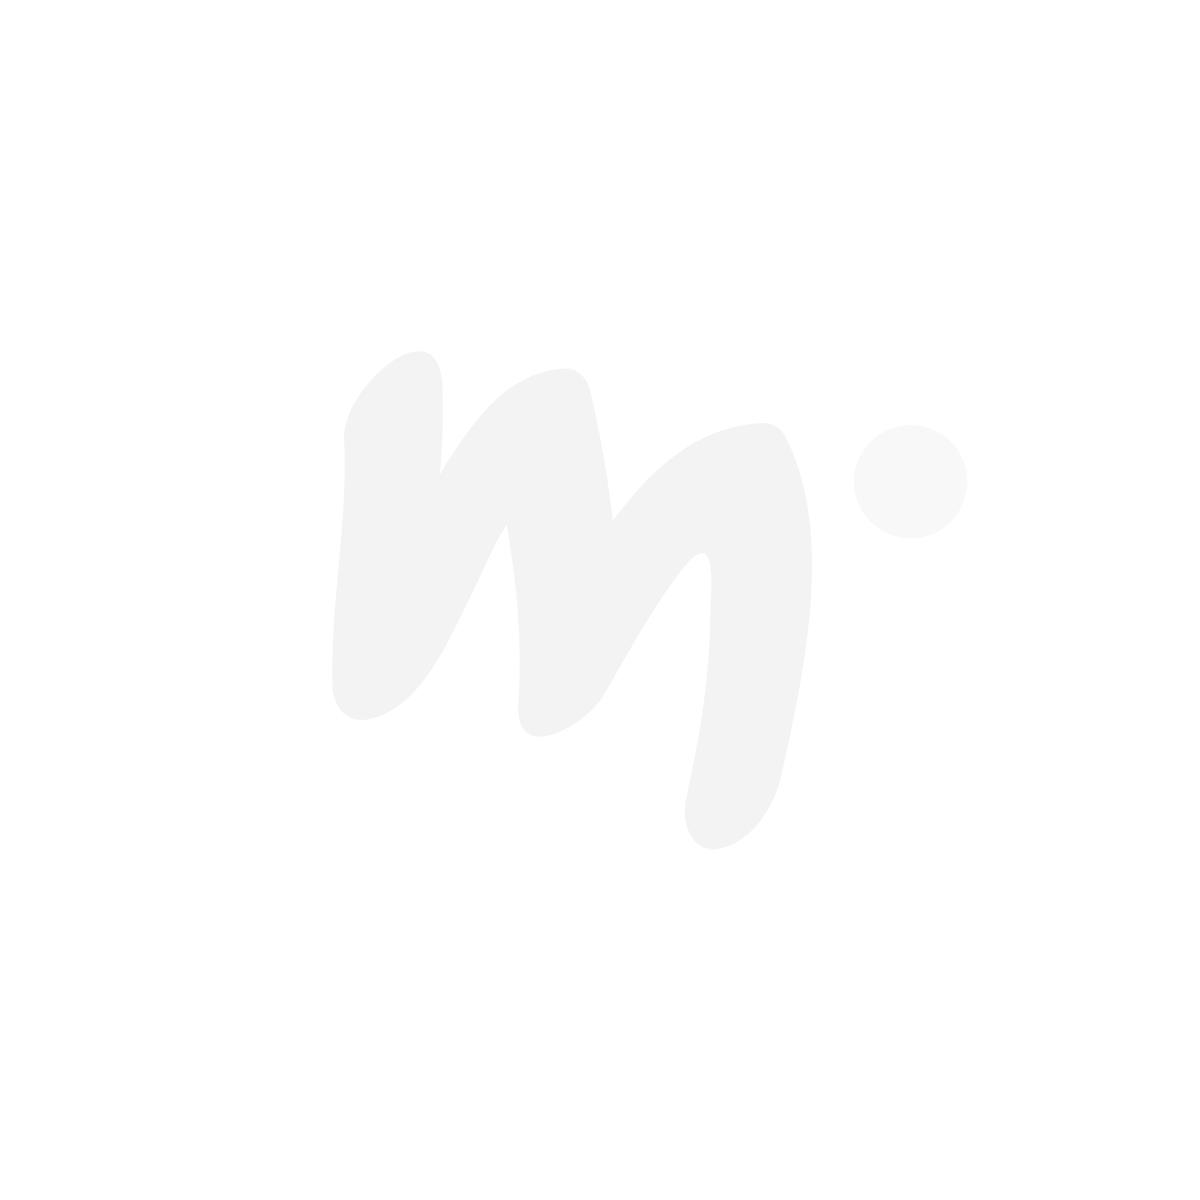 Mx Deco Glittertonttu 20 cm vaaleanpunainen